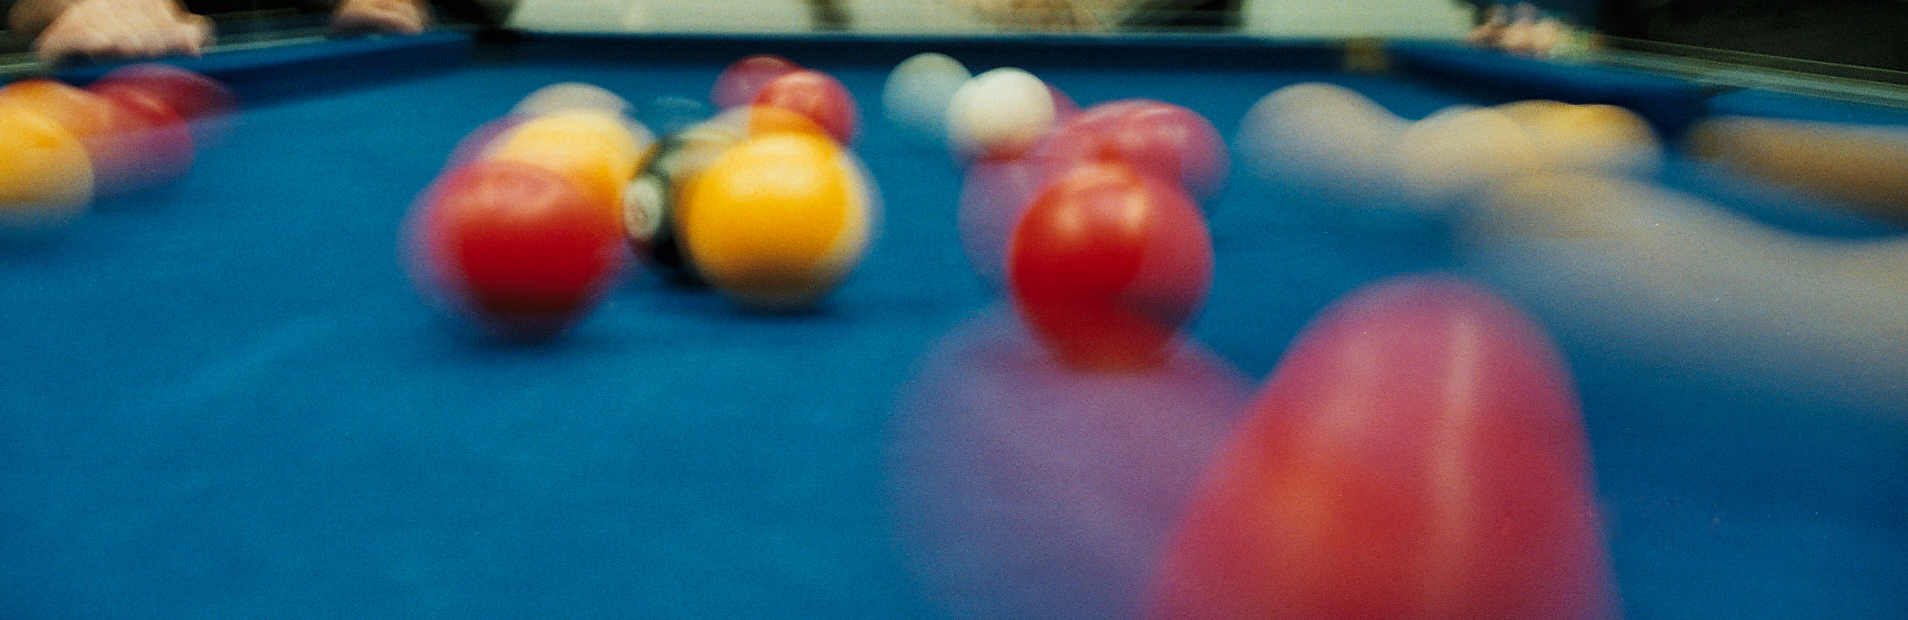 Buy Pool Table Cloth Uk